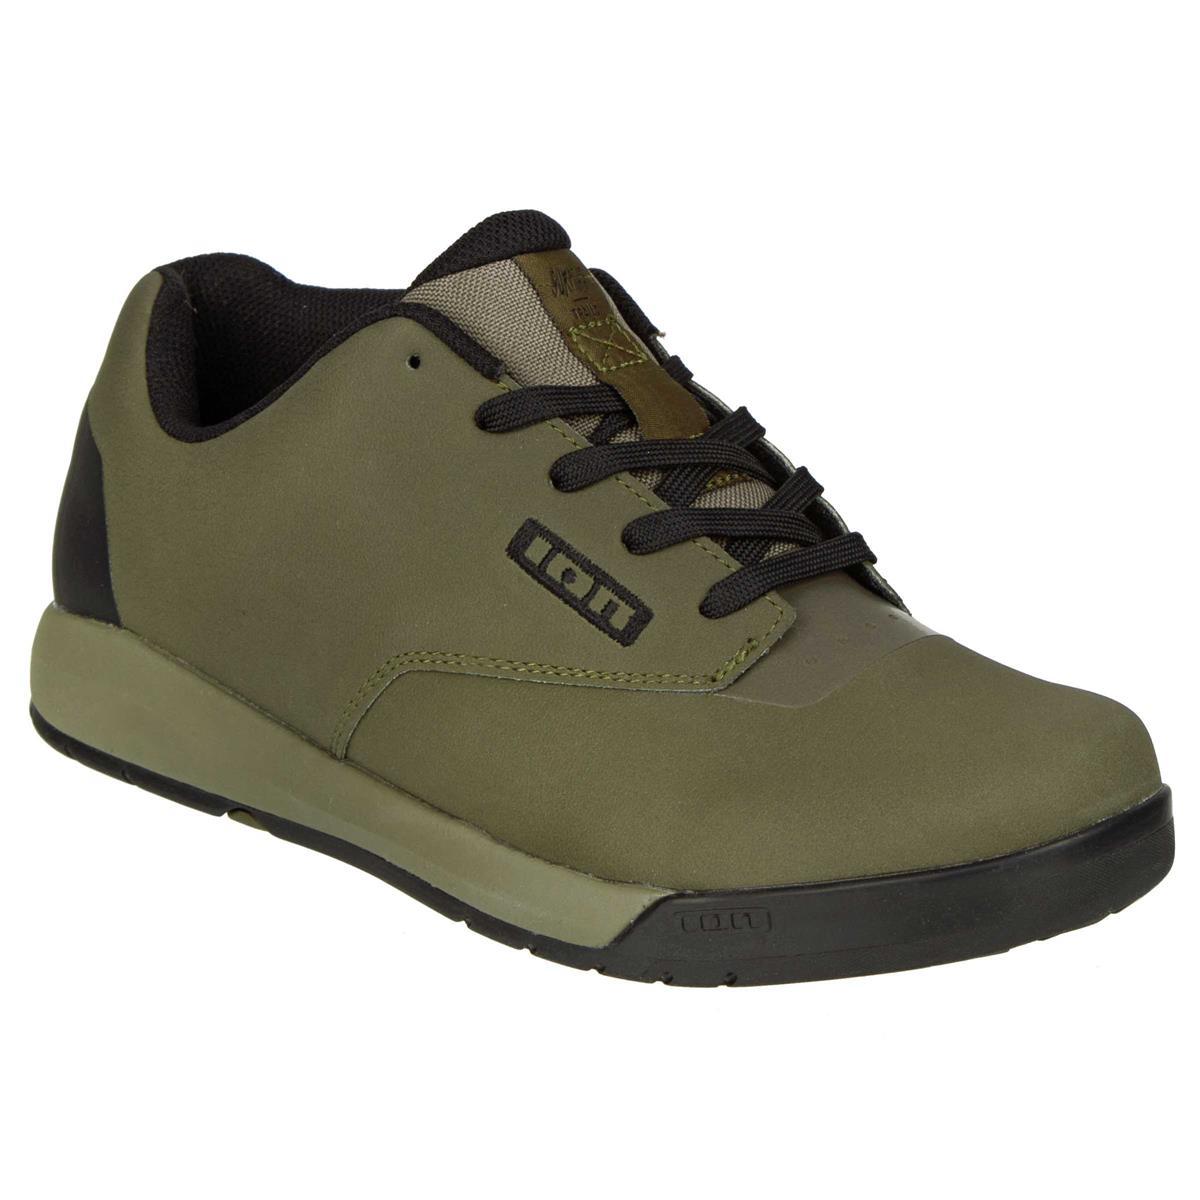 ION MTB Schuhe Raid II Crank Crocodile